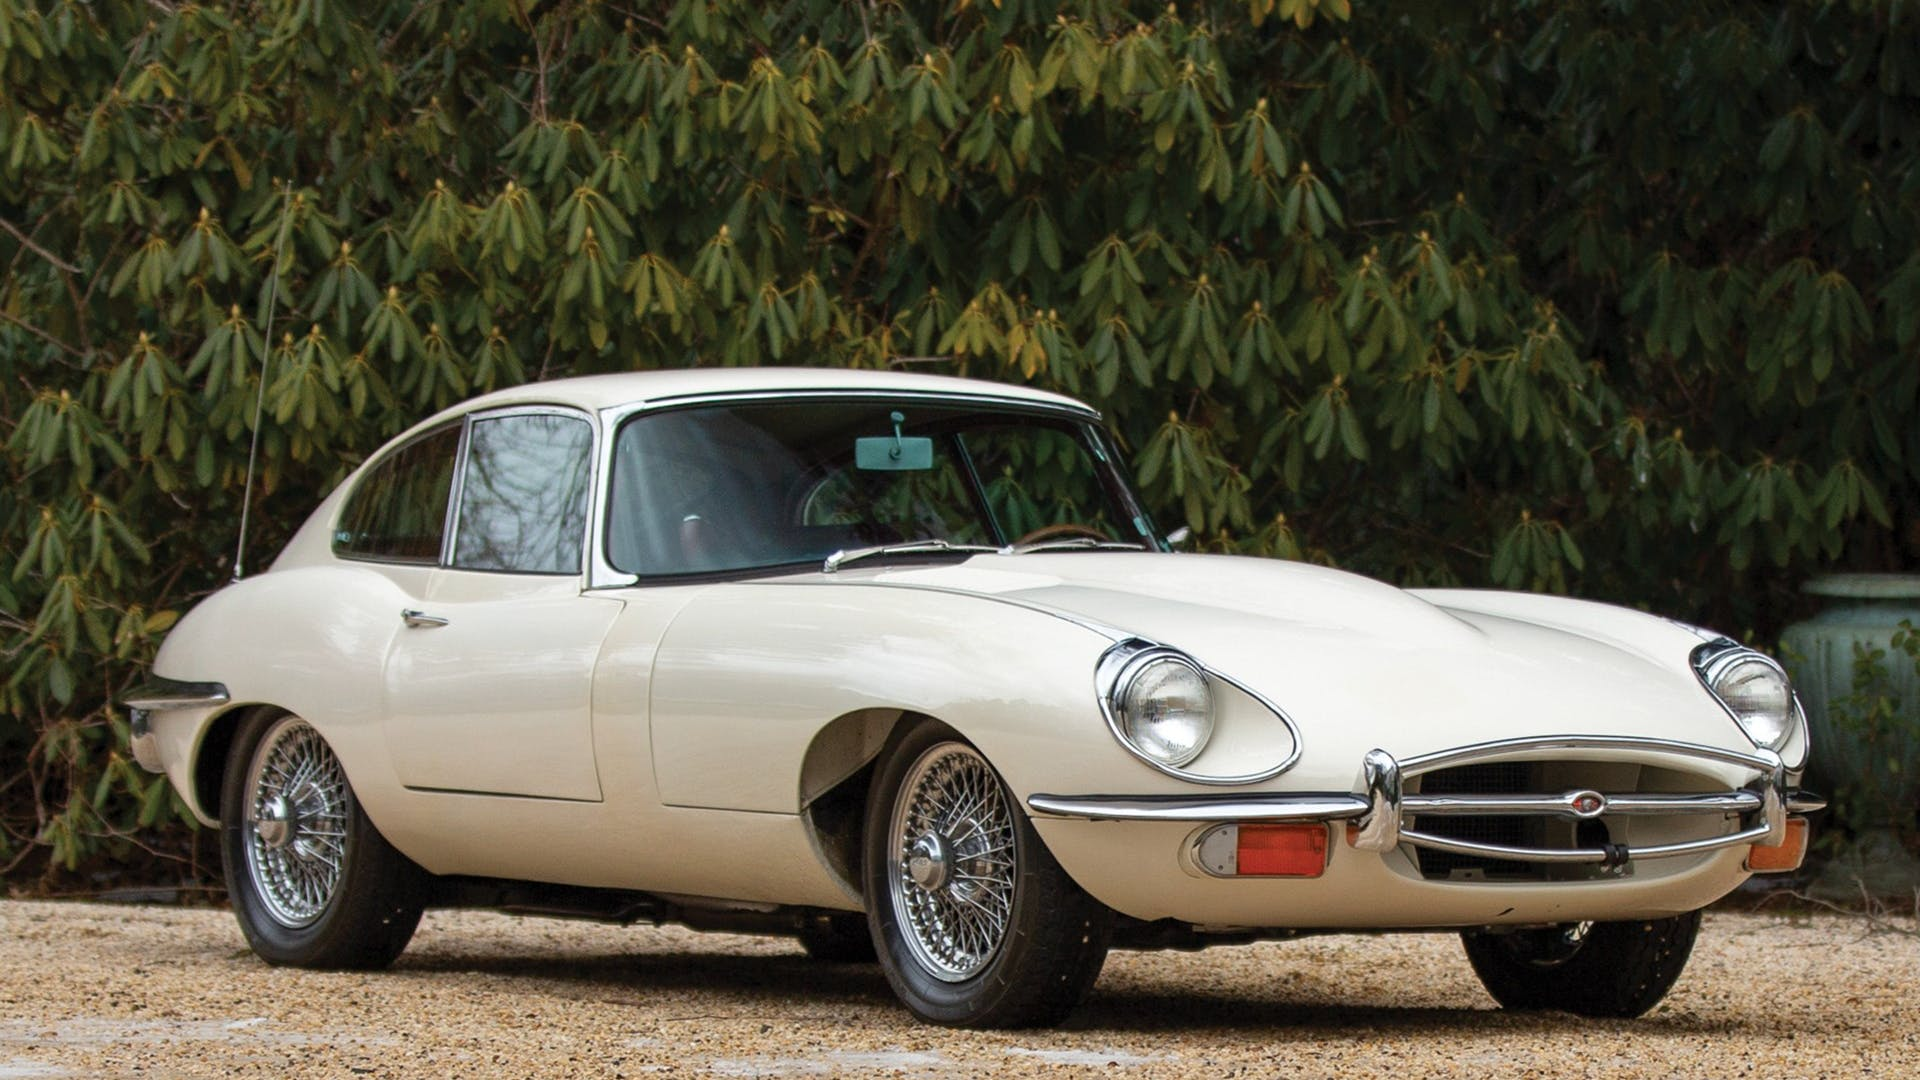 1969 Jaguar E-Type Series 2 4.2-Litre Fixed Head Coupe